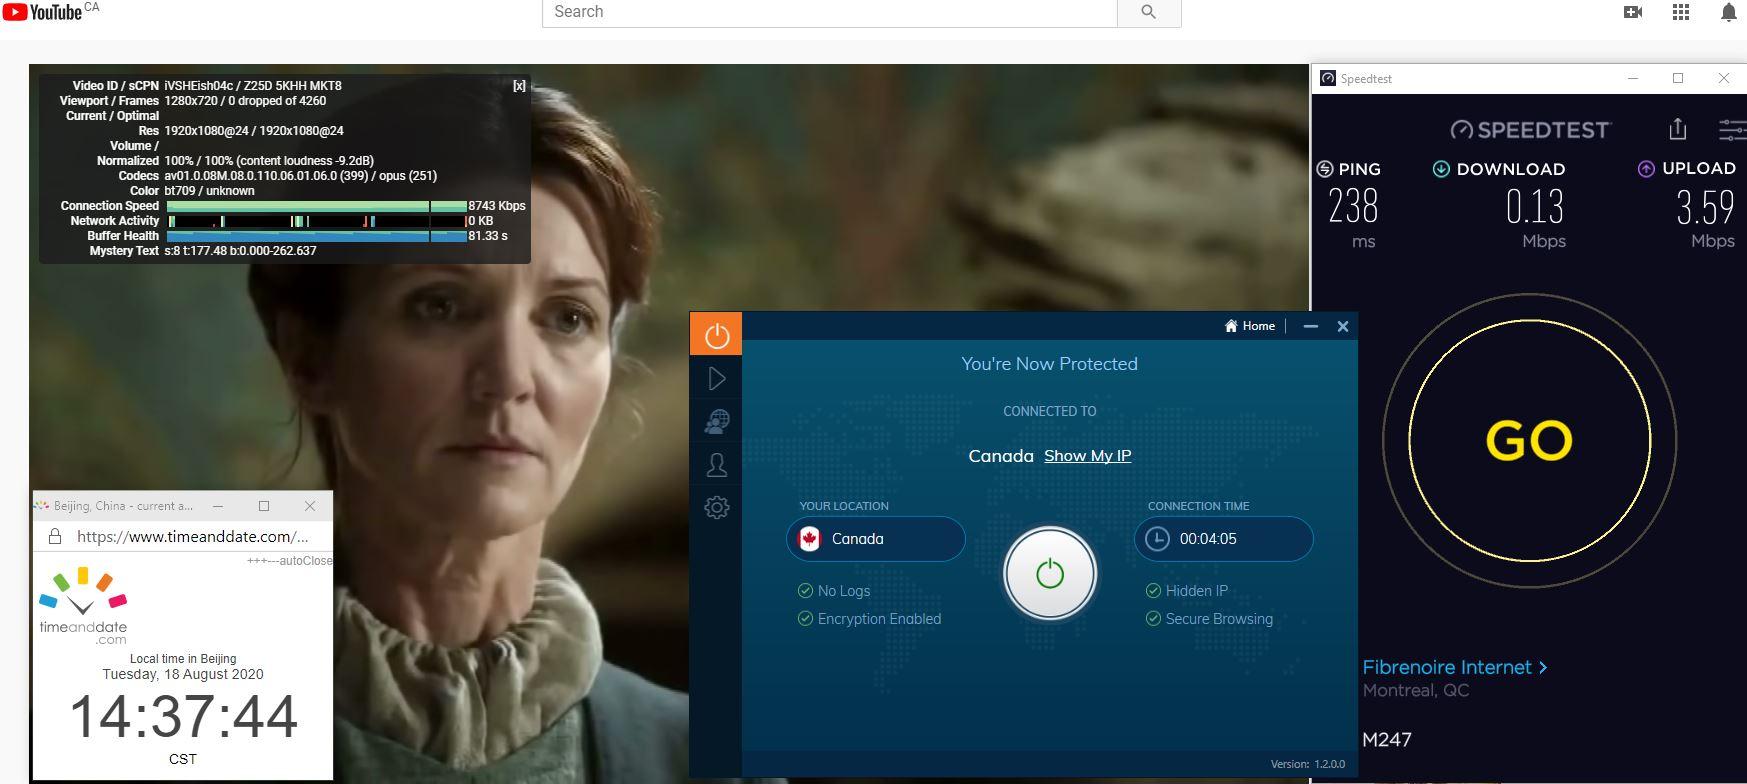 Windows10 IvacyVPN Canada中国VPN 翻墙 科学上网 翻墙速度测试 - 20200818